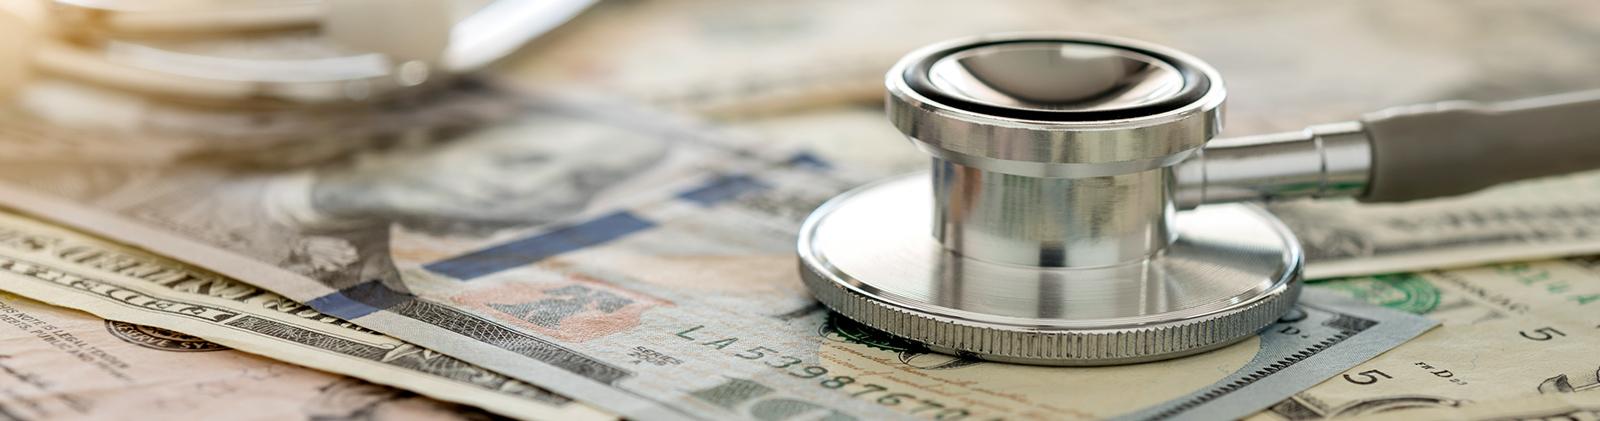 Hospital Indemnity Plan